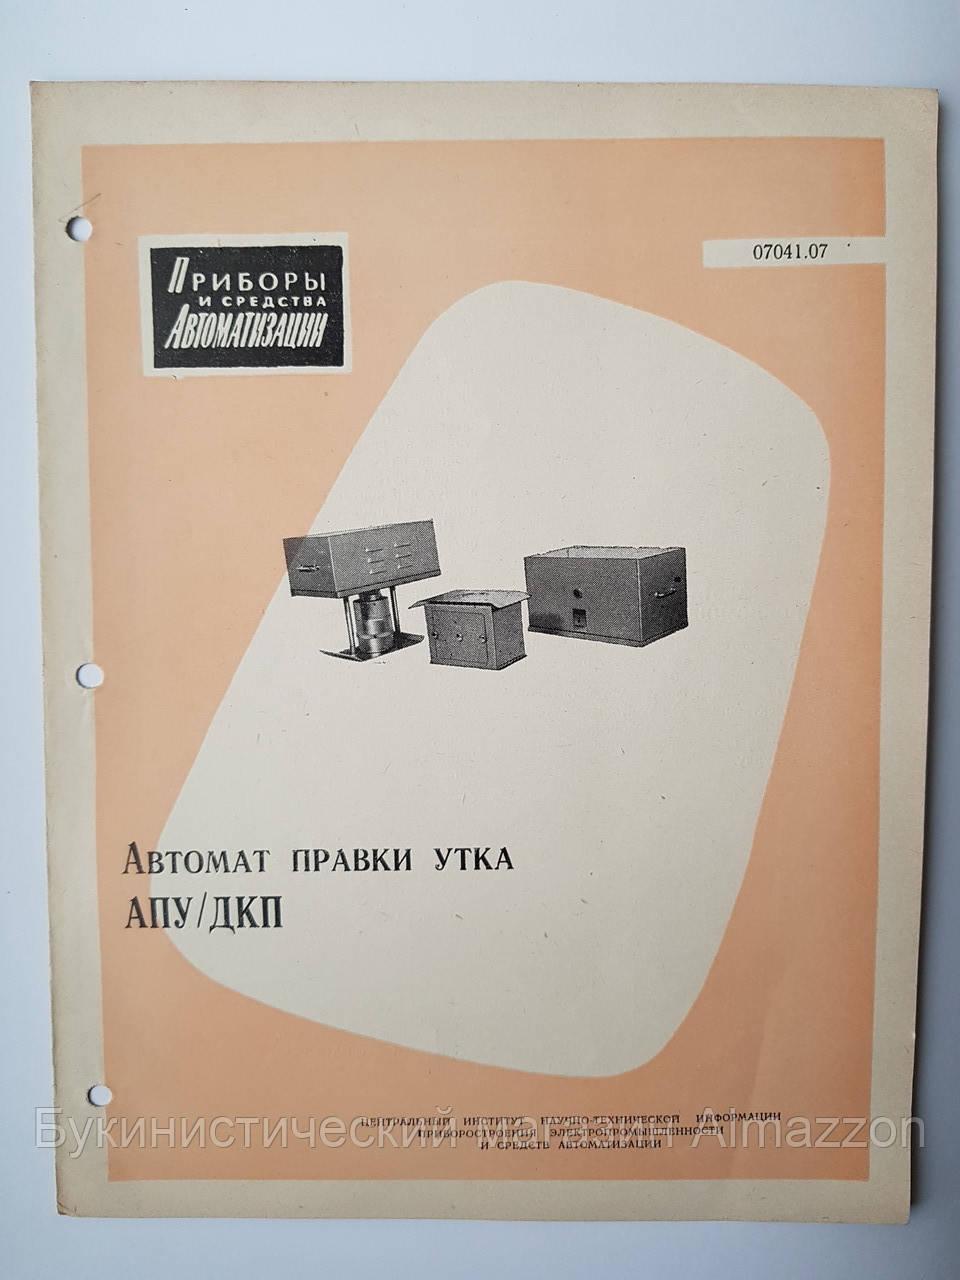 "Журнал (Бюллетень) ""Автомат правки утка АПУ/ДКП  07041.07 "" 1963г."